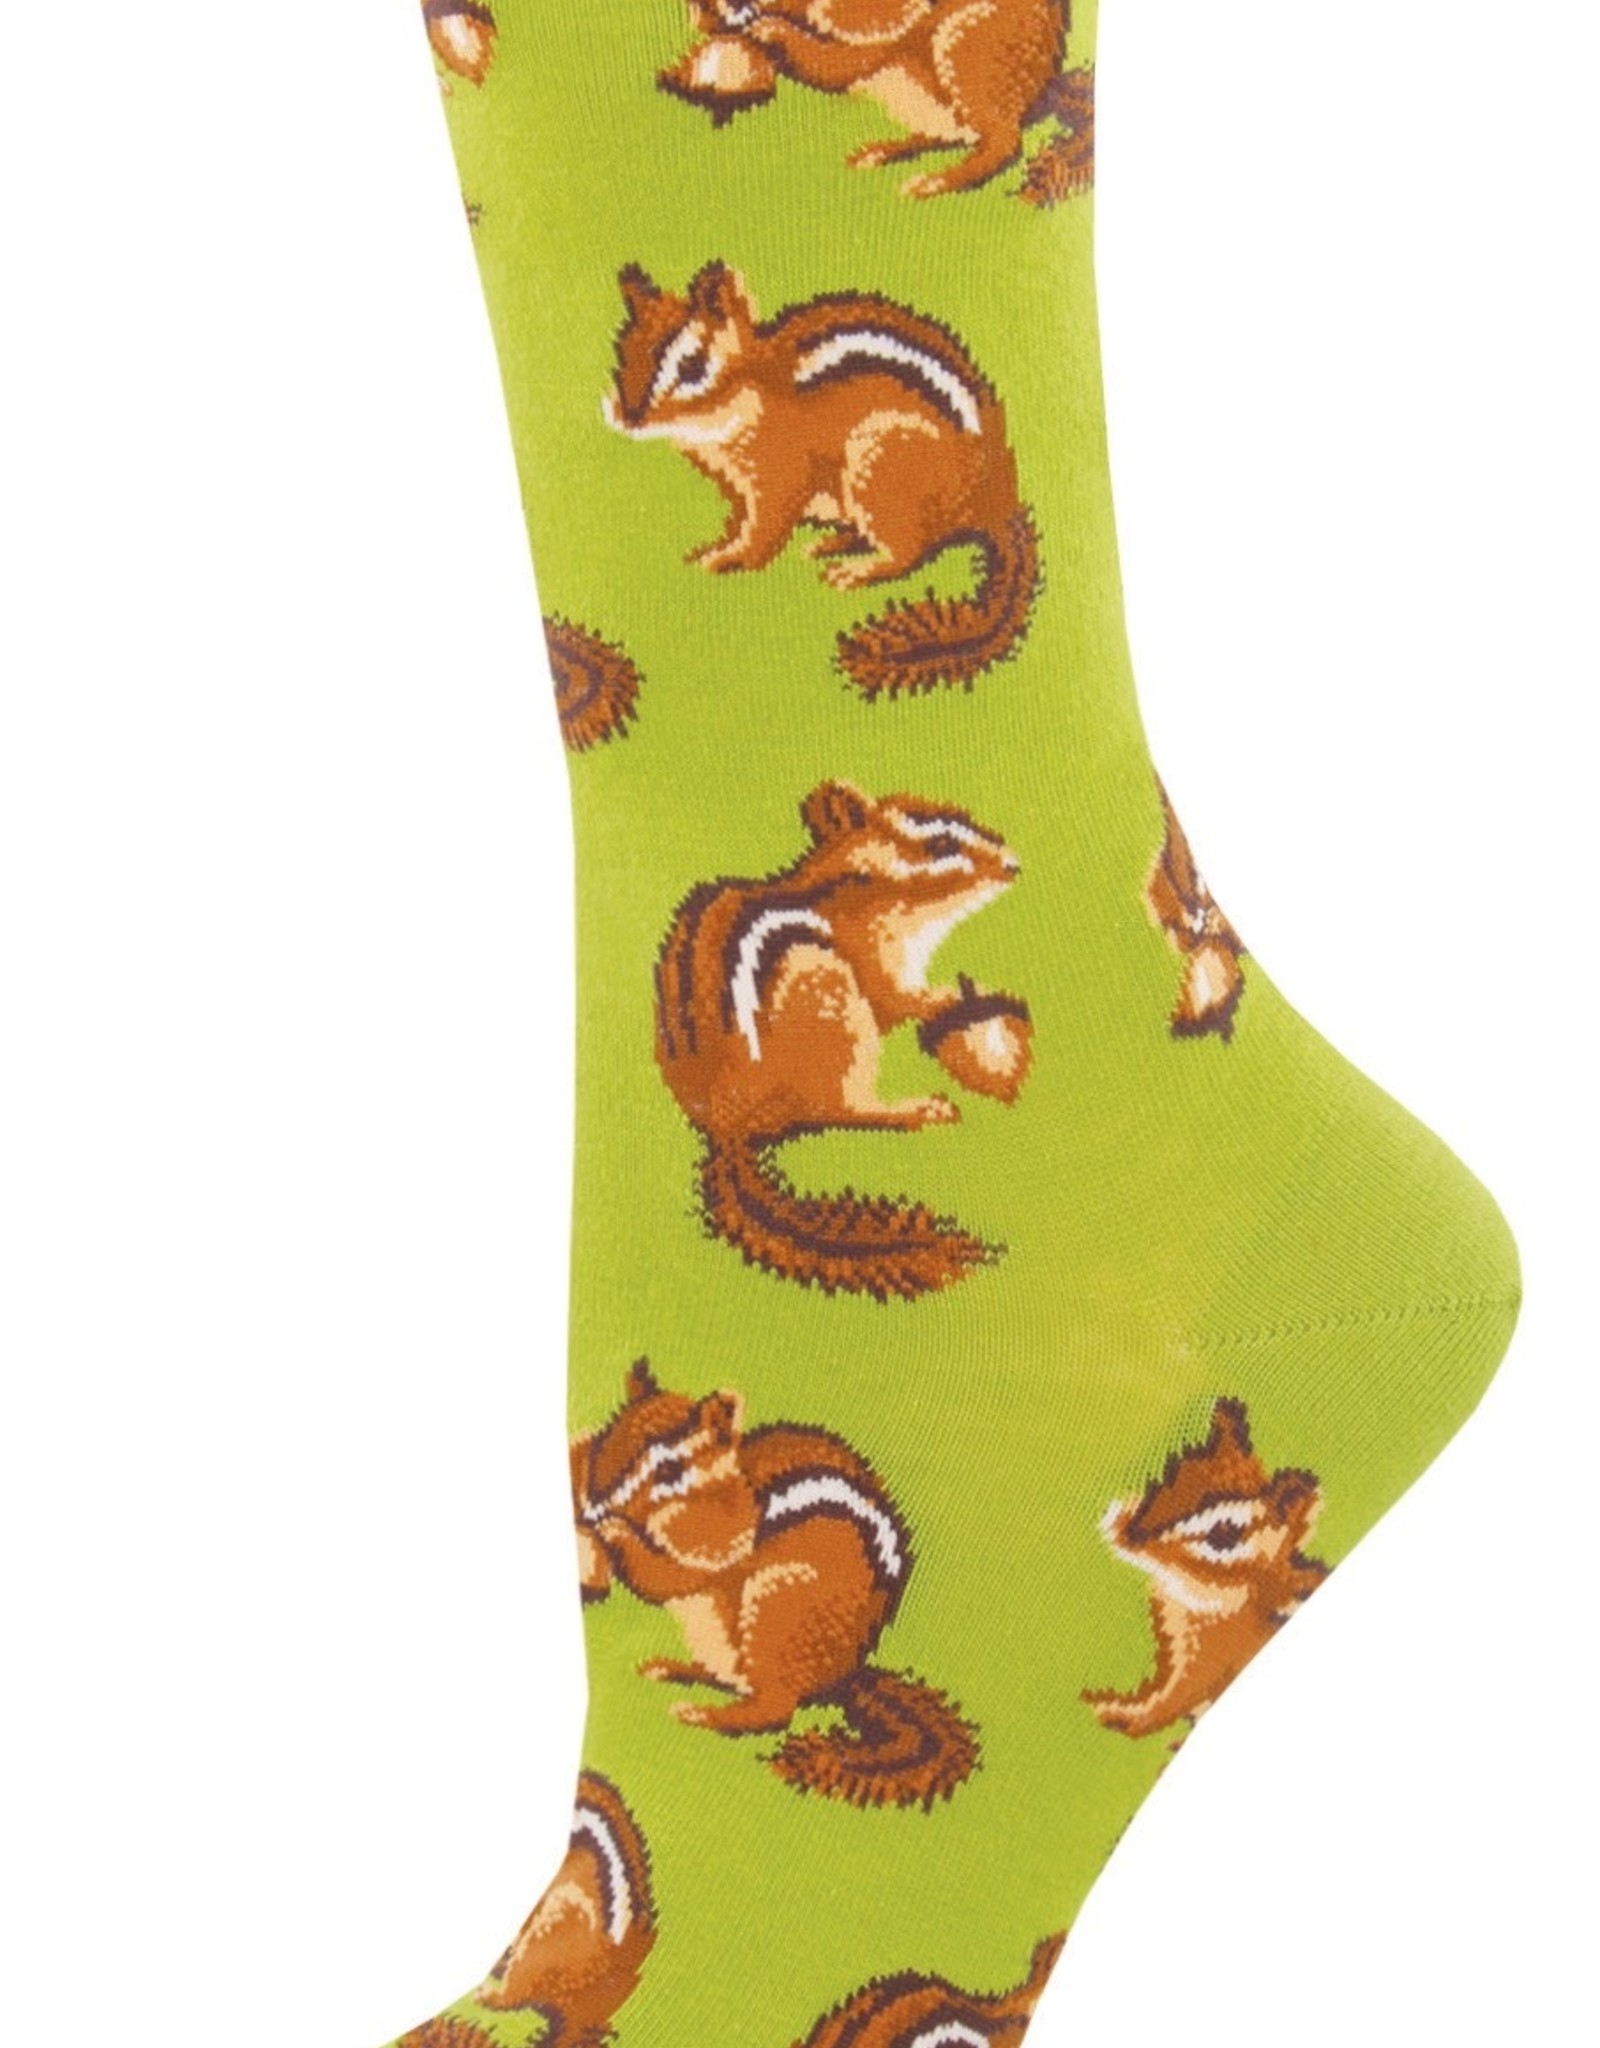 Chipmunk Cheeks green socks